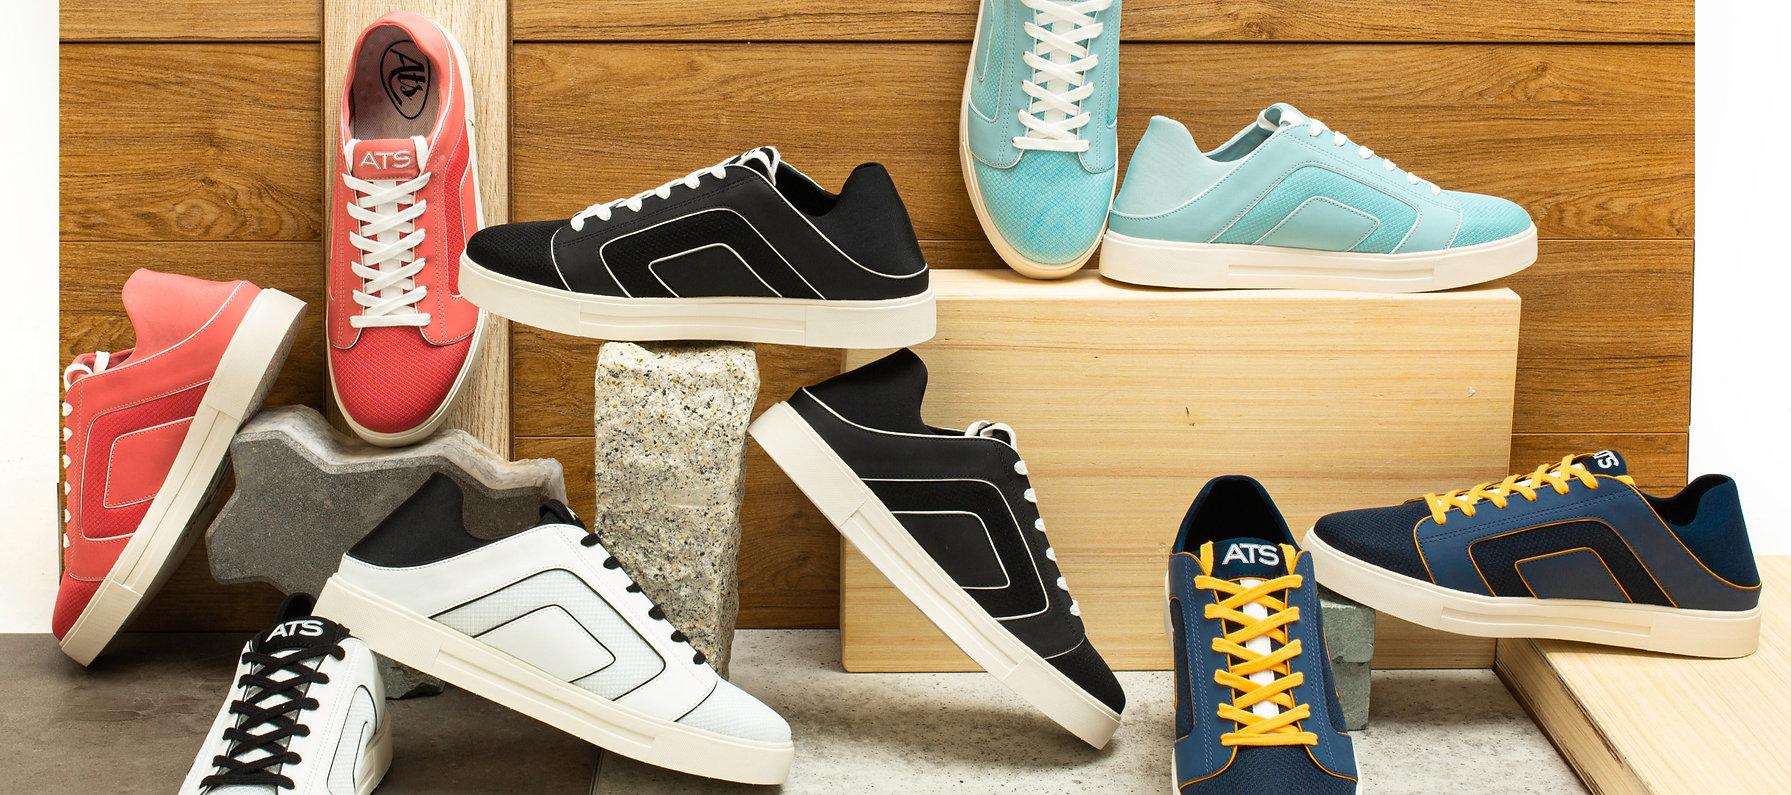 Shoe%20112%20a_edited.jpg